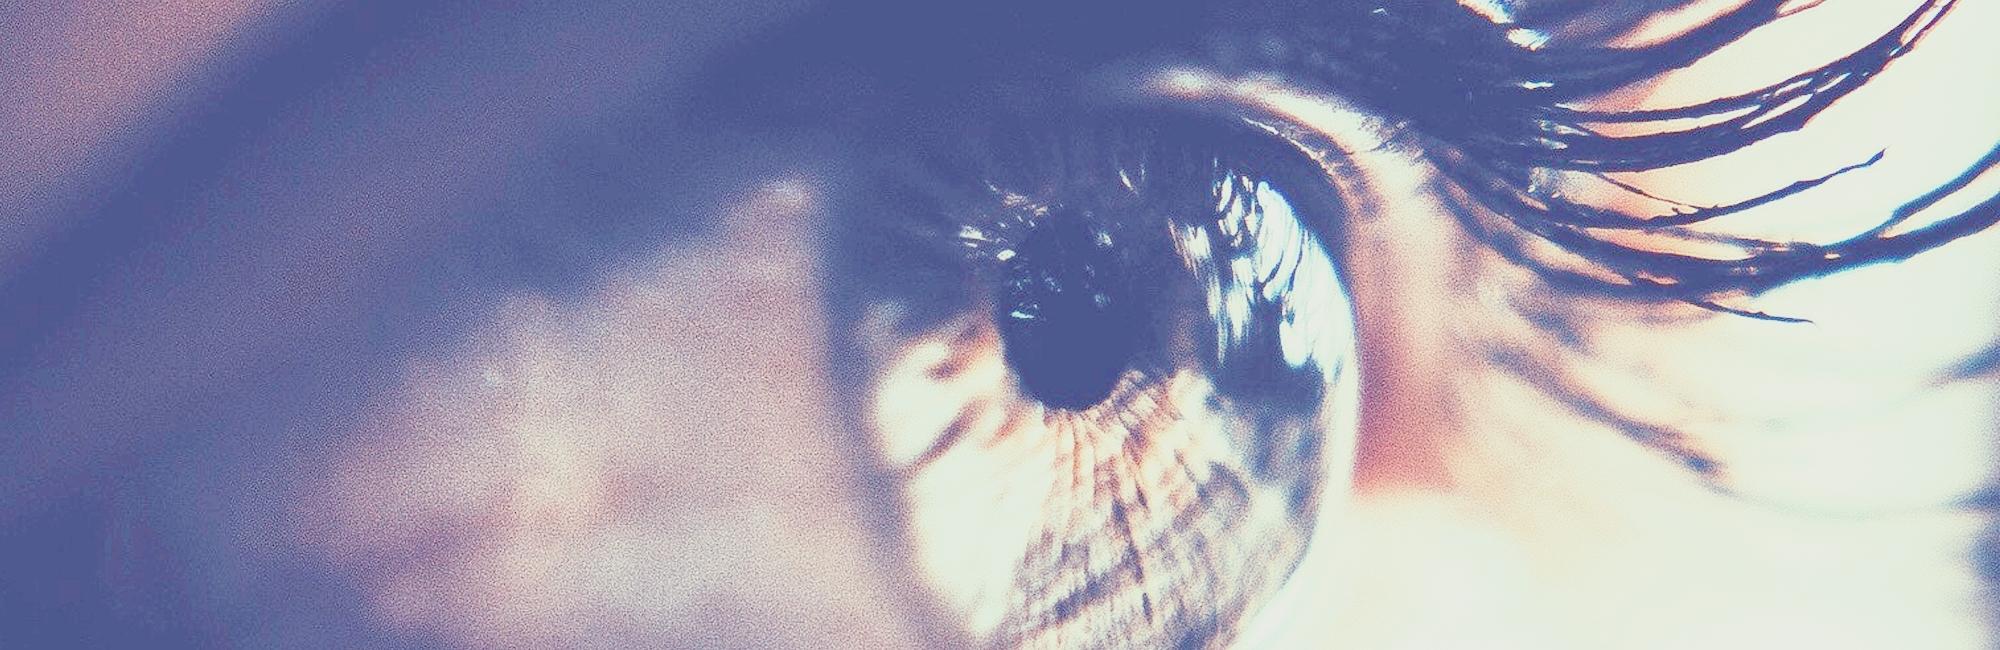 NHS EYE TESTS - How often am I entitled to a free NHS eye test?